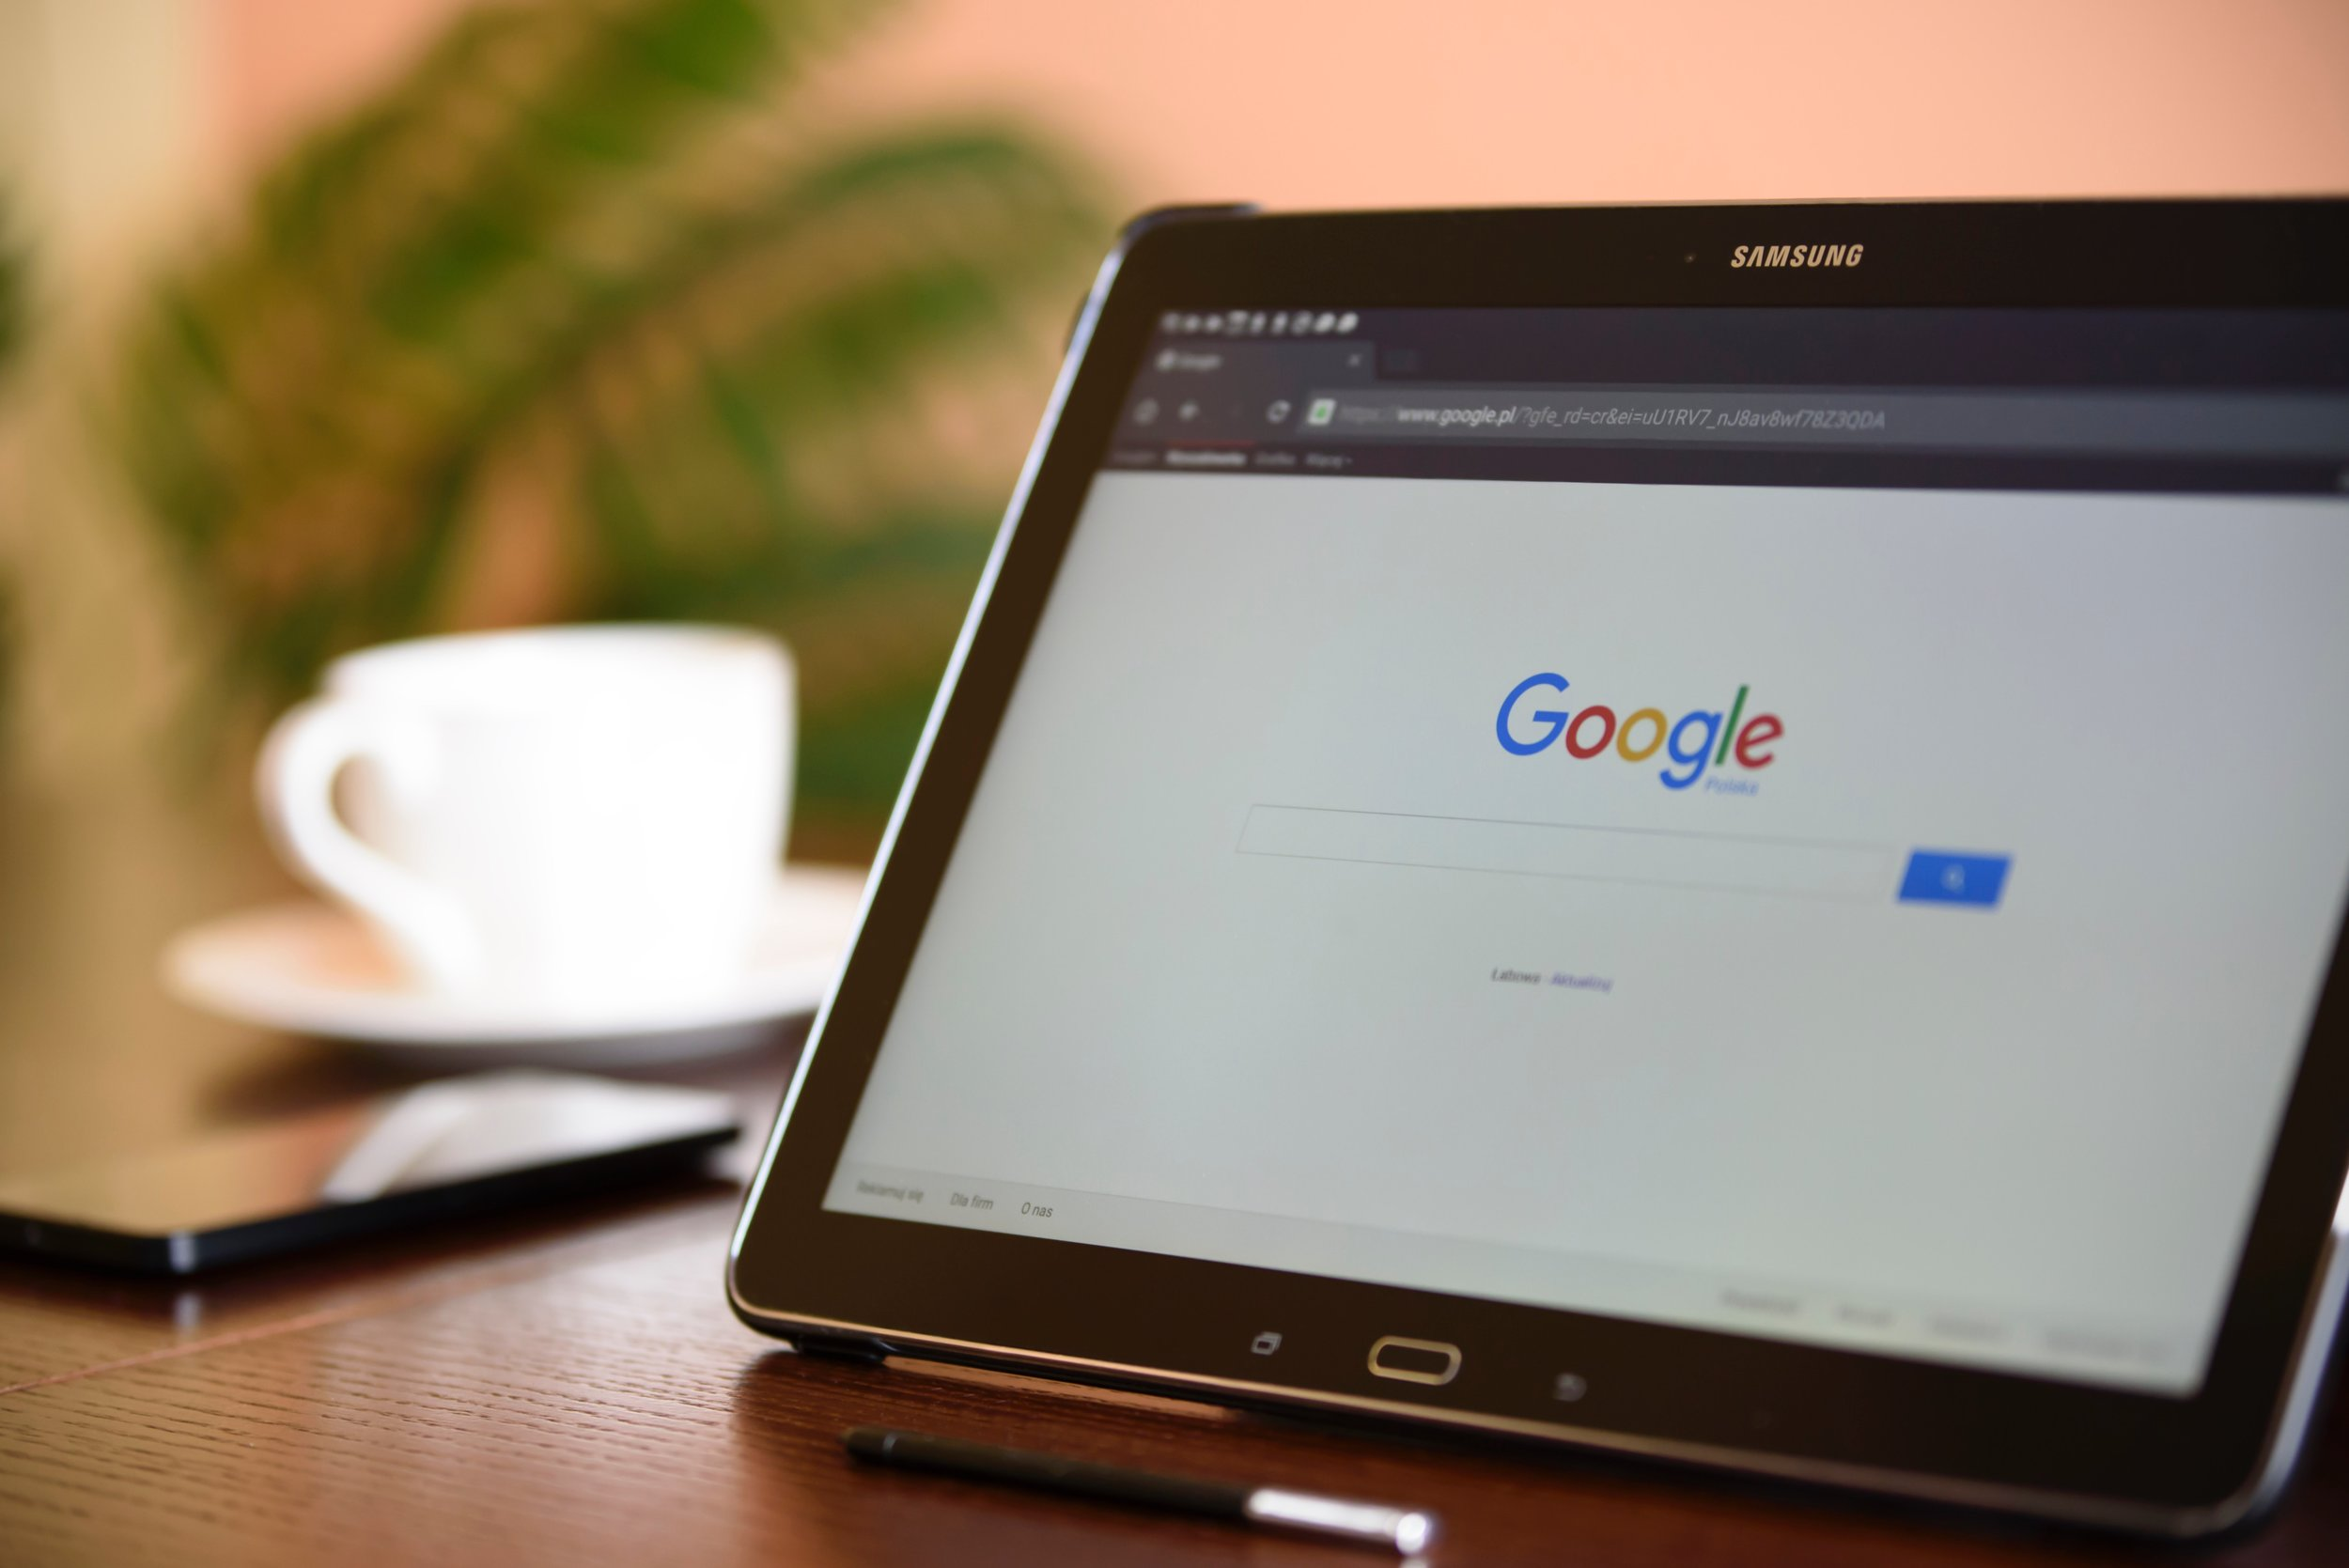 gadget-google-samsung-106341.jpg